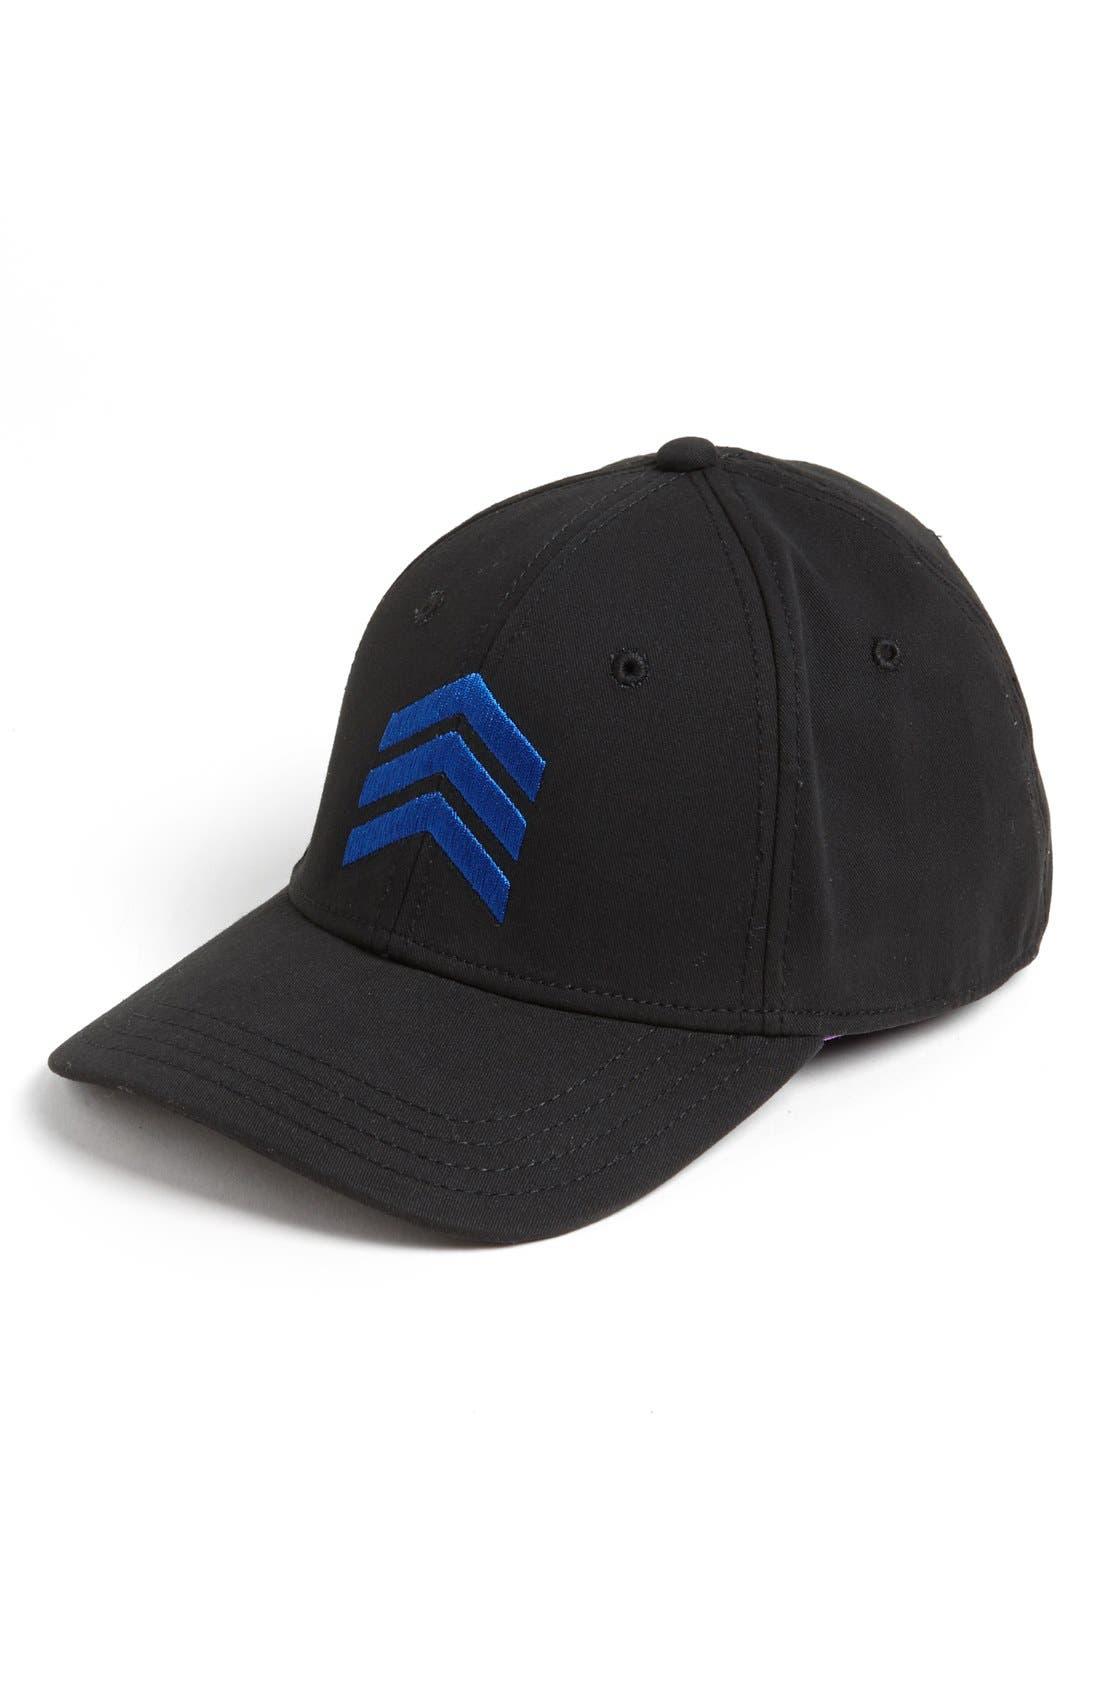 Alternate Image 1 Selected - Gents 'Forward' Baseball Cap